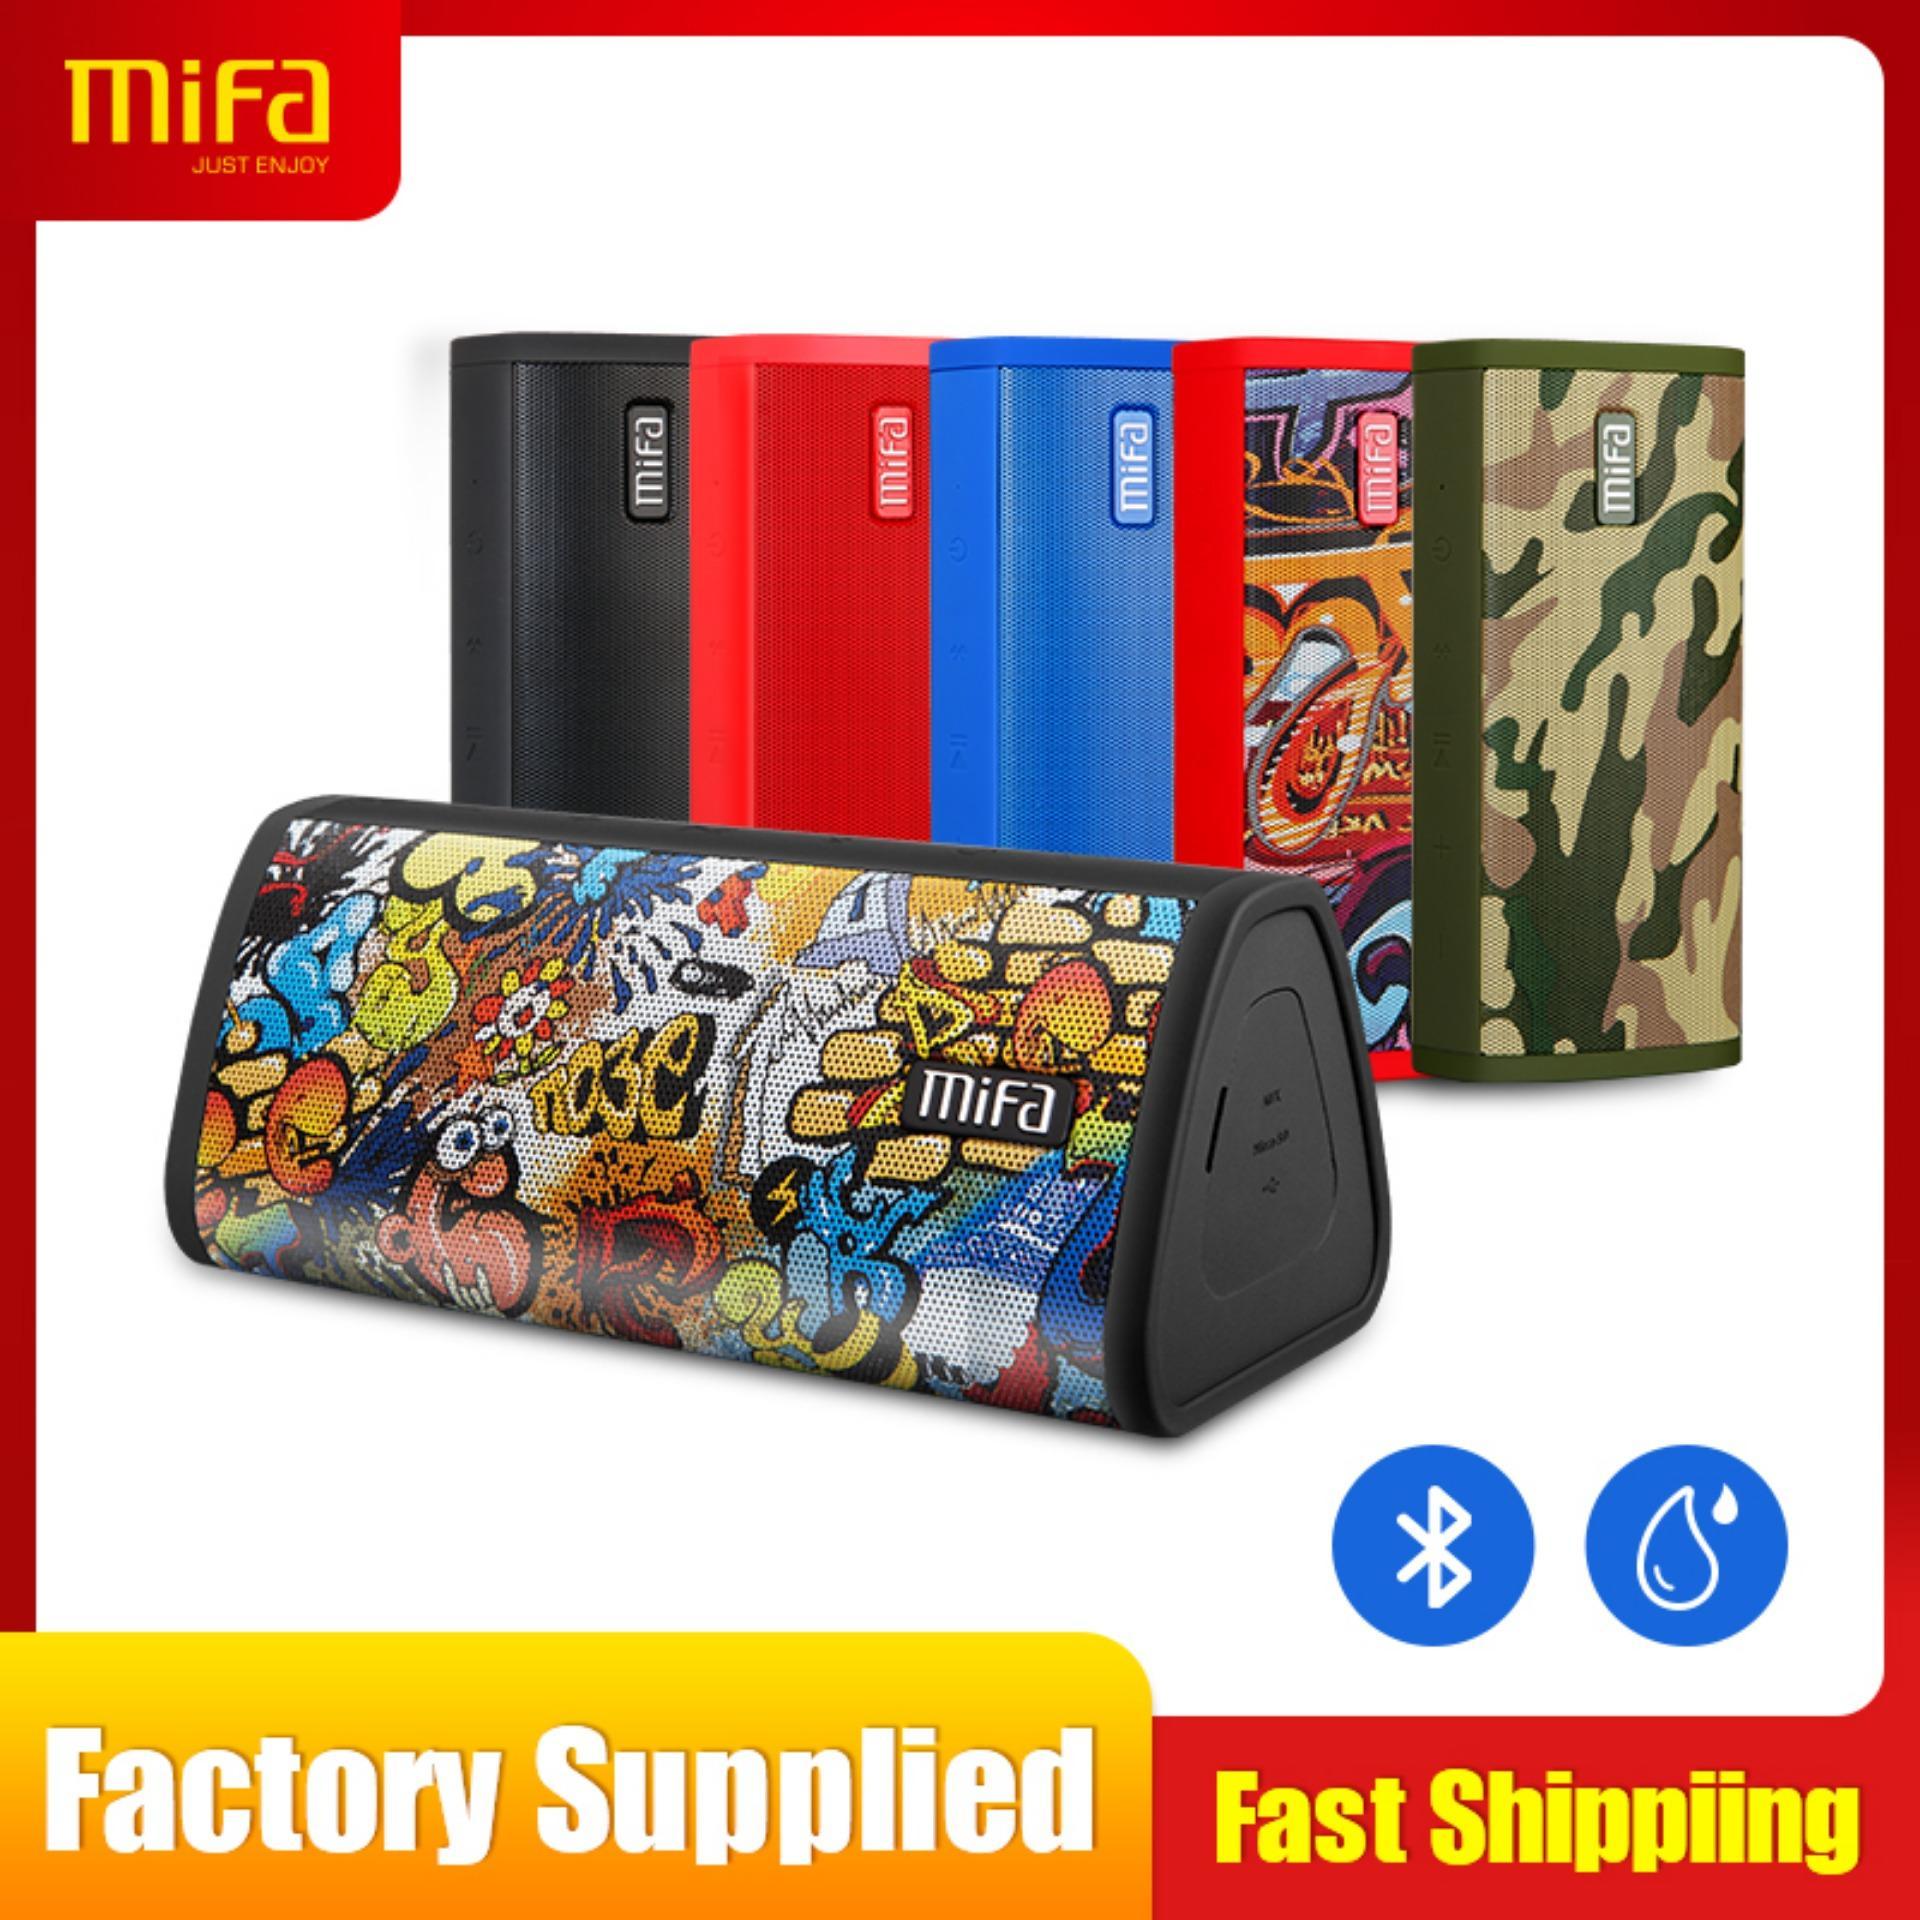 d913df0845b [24 MONTH WARRANTY]MIFA A10 Wireless Bluetooth Speaker, 16-Hour Playtime,